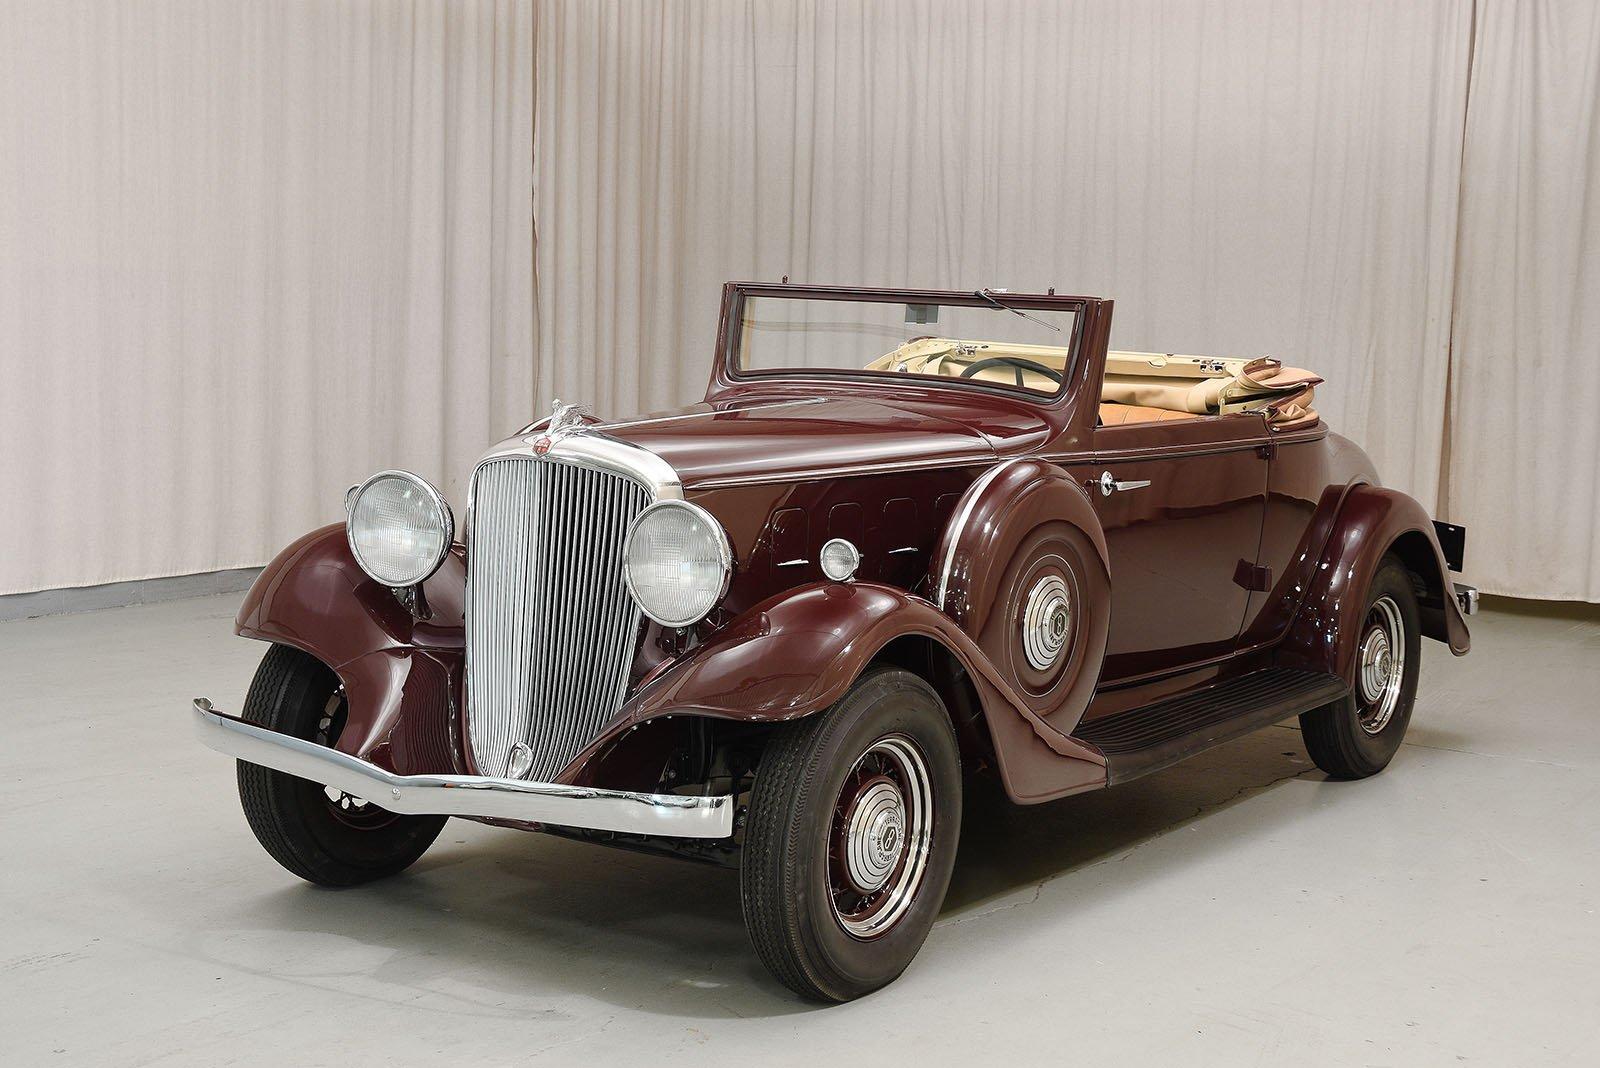 1933 Essex Terraplane 8 Rumble Seat Roadster Hyman Ltd